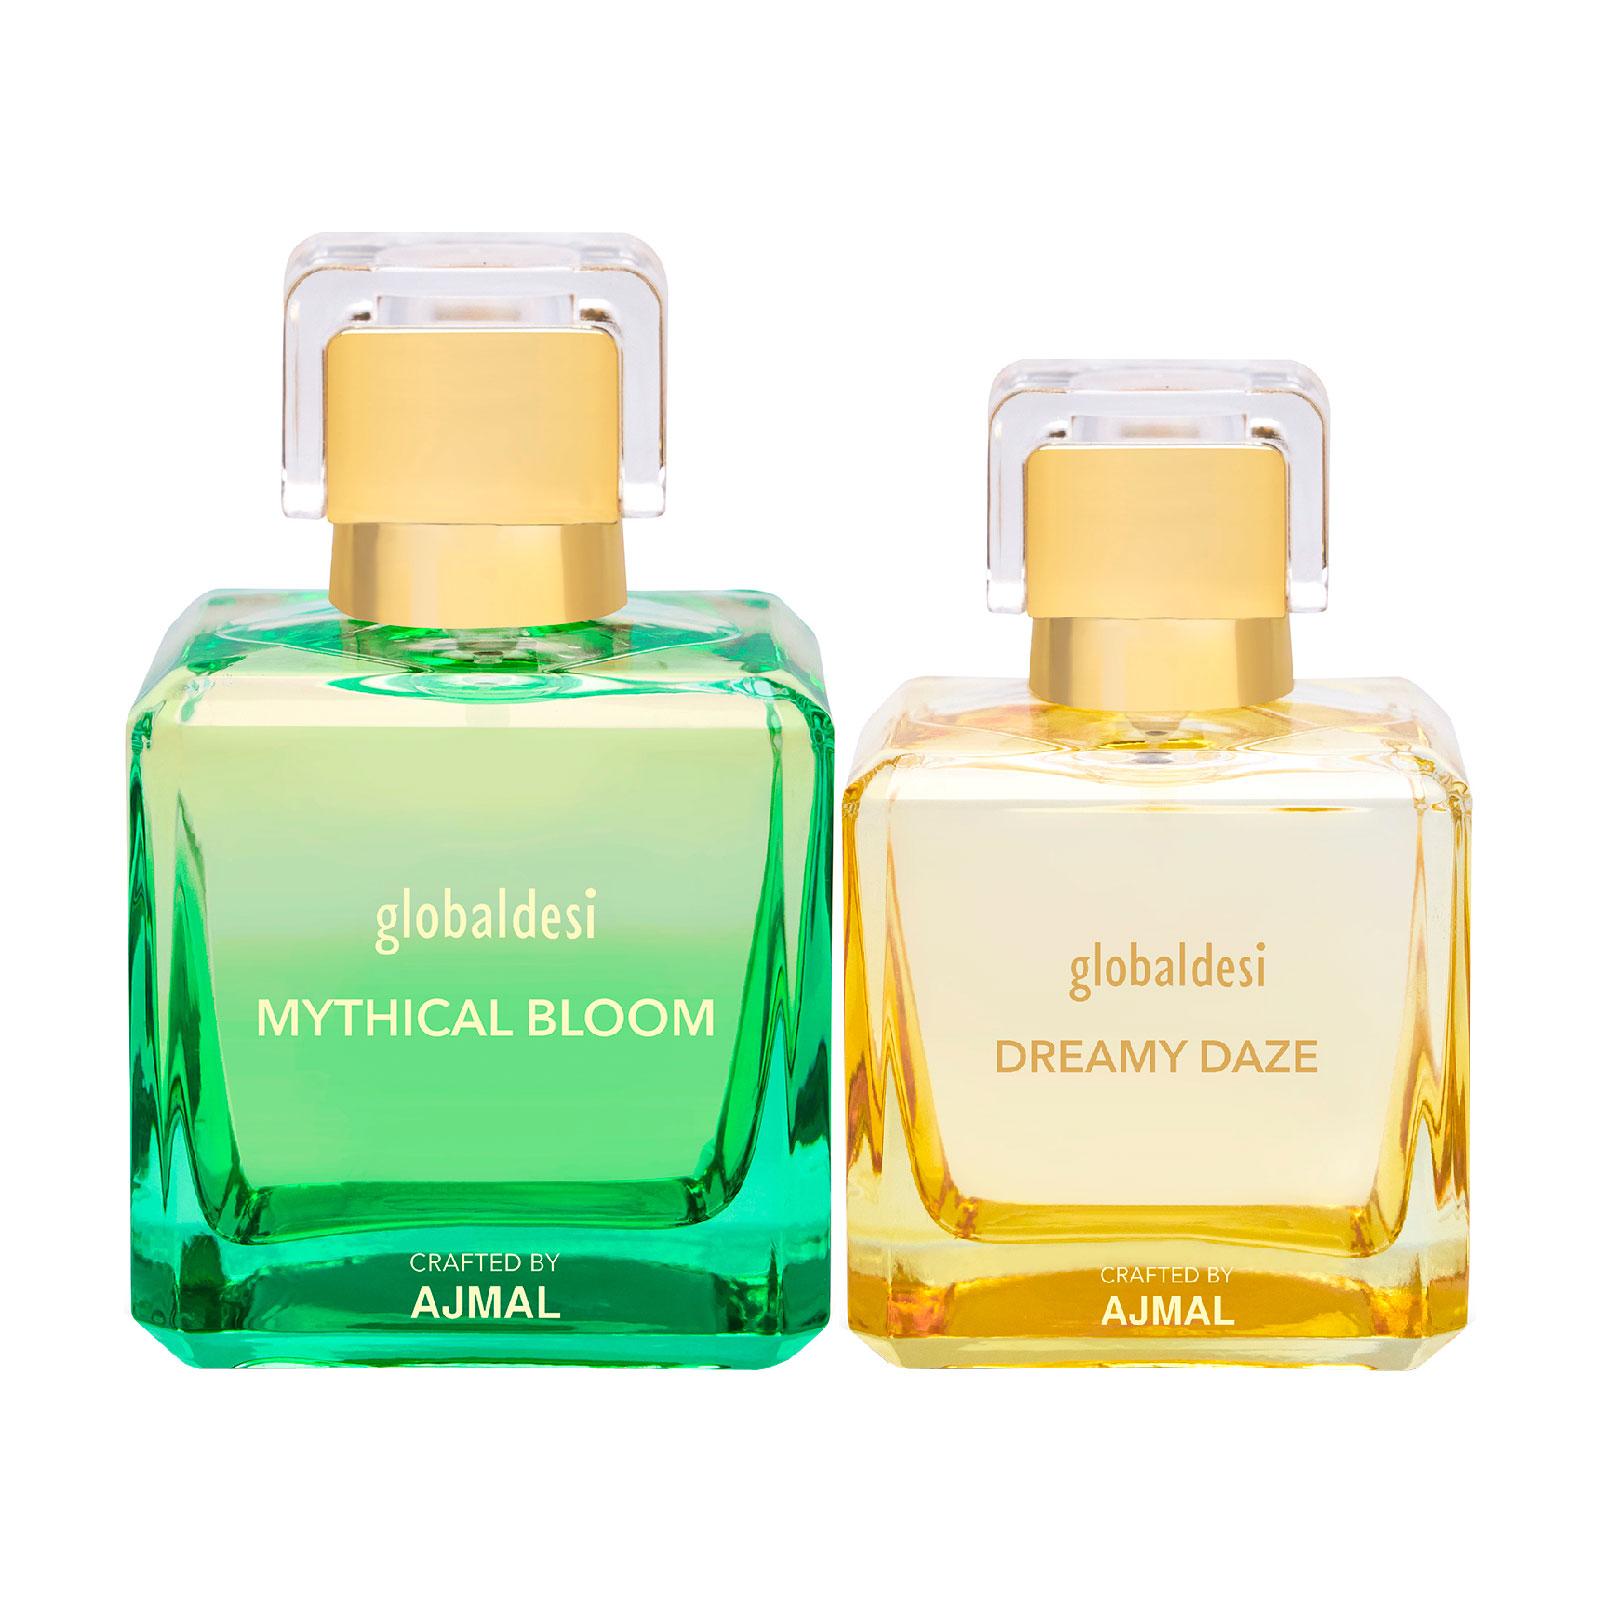 Global Desi Crafted By Ajmal | Global Mythical Bloom 100ML & Dreamy Daze 50ML Eau De Parfum for Women Crafted by Ajmal + 2 Parfum Testers